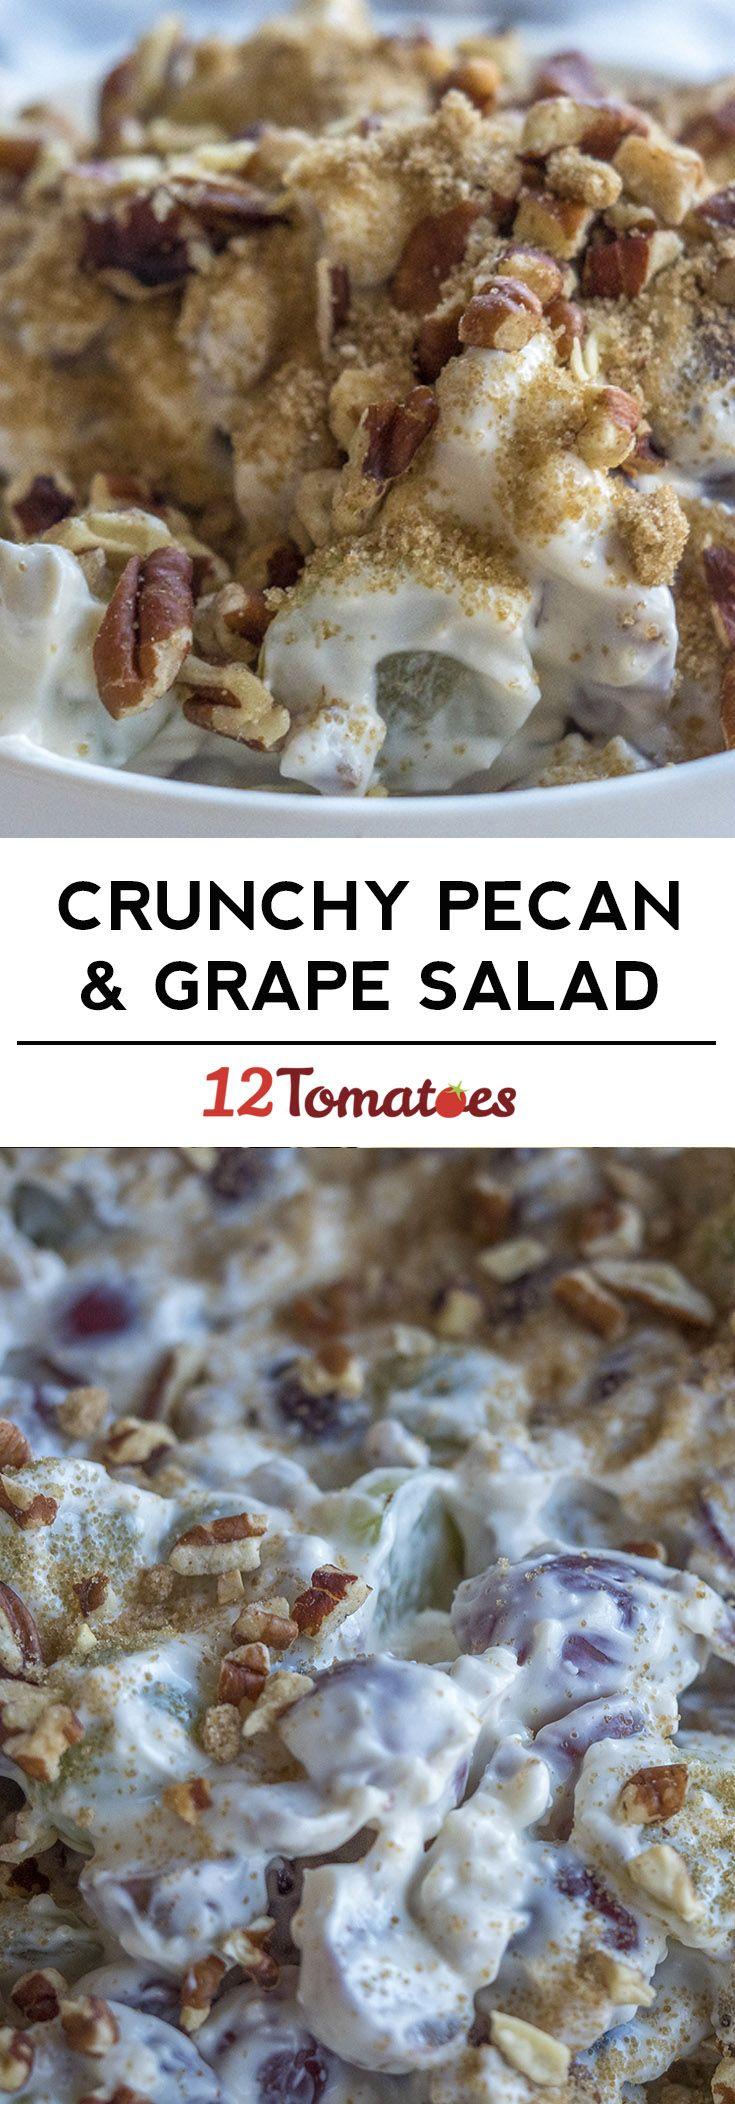 Crunchy Pecan Grape Salad                                                                                                                                                                                 More